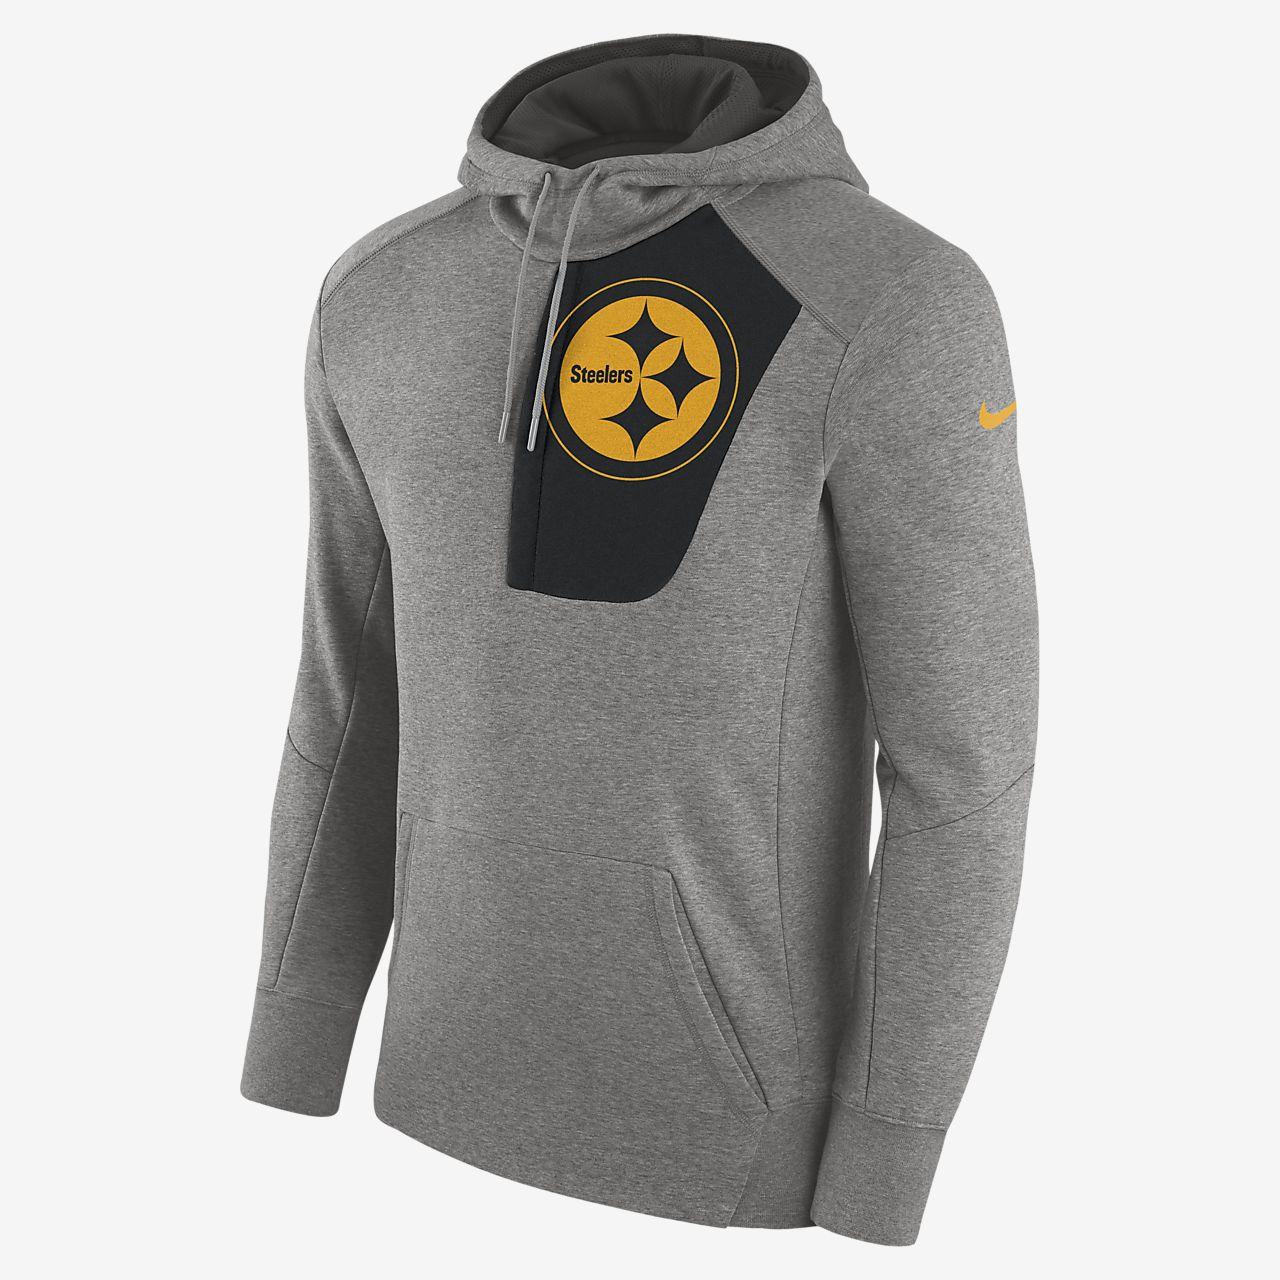 Sudadera con capucha para hombre Nike Fly Fleece (NFL Steelers ... 259e9fafb20